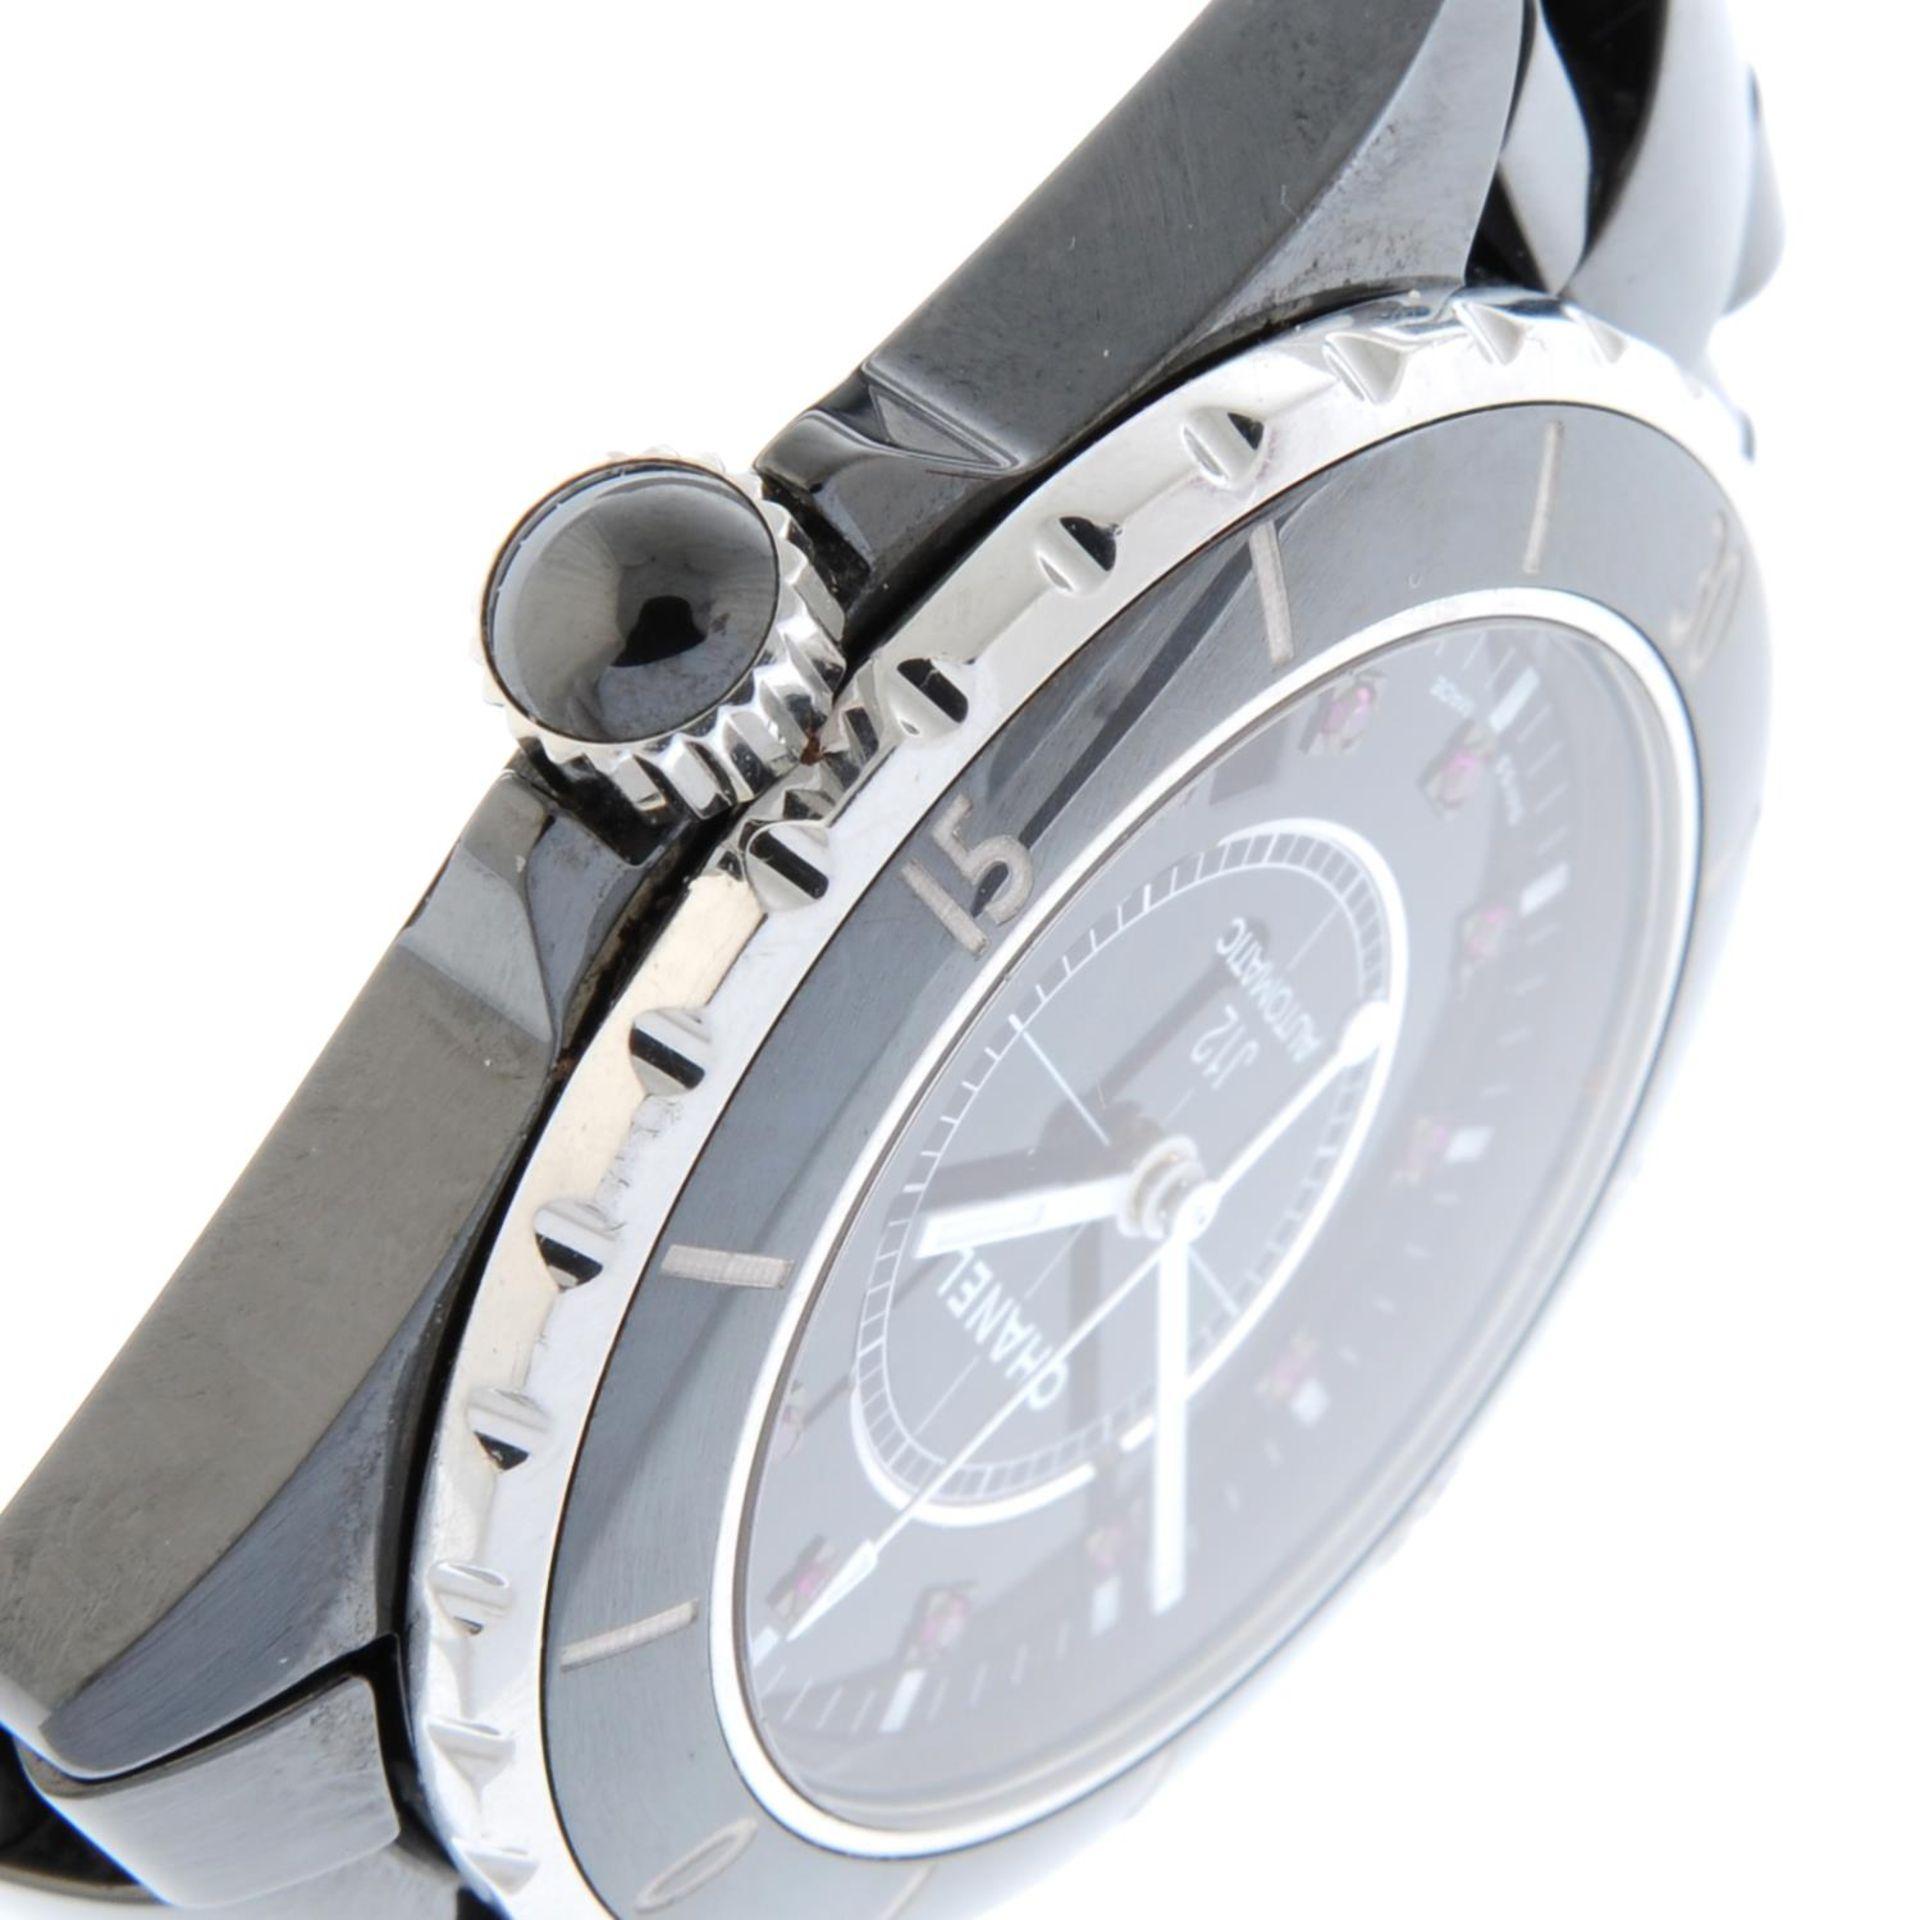 CHANEL - a J12 bracelet watch. - Bild 4 aus 5